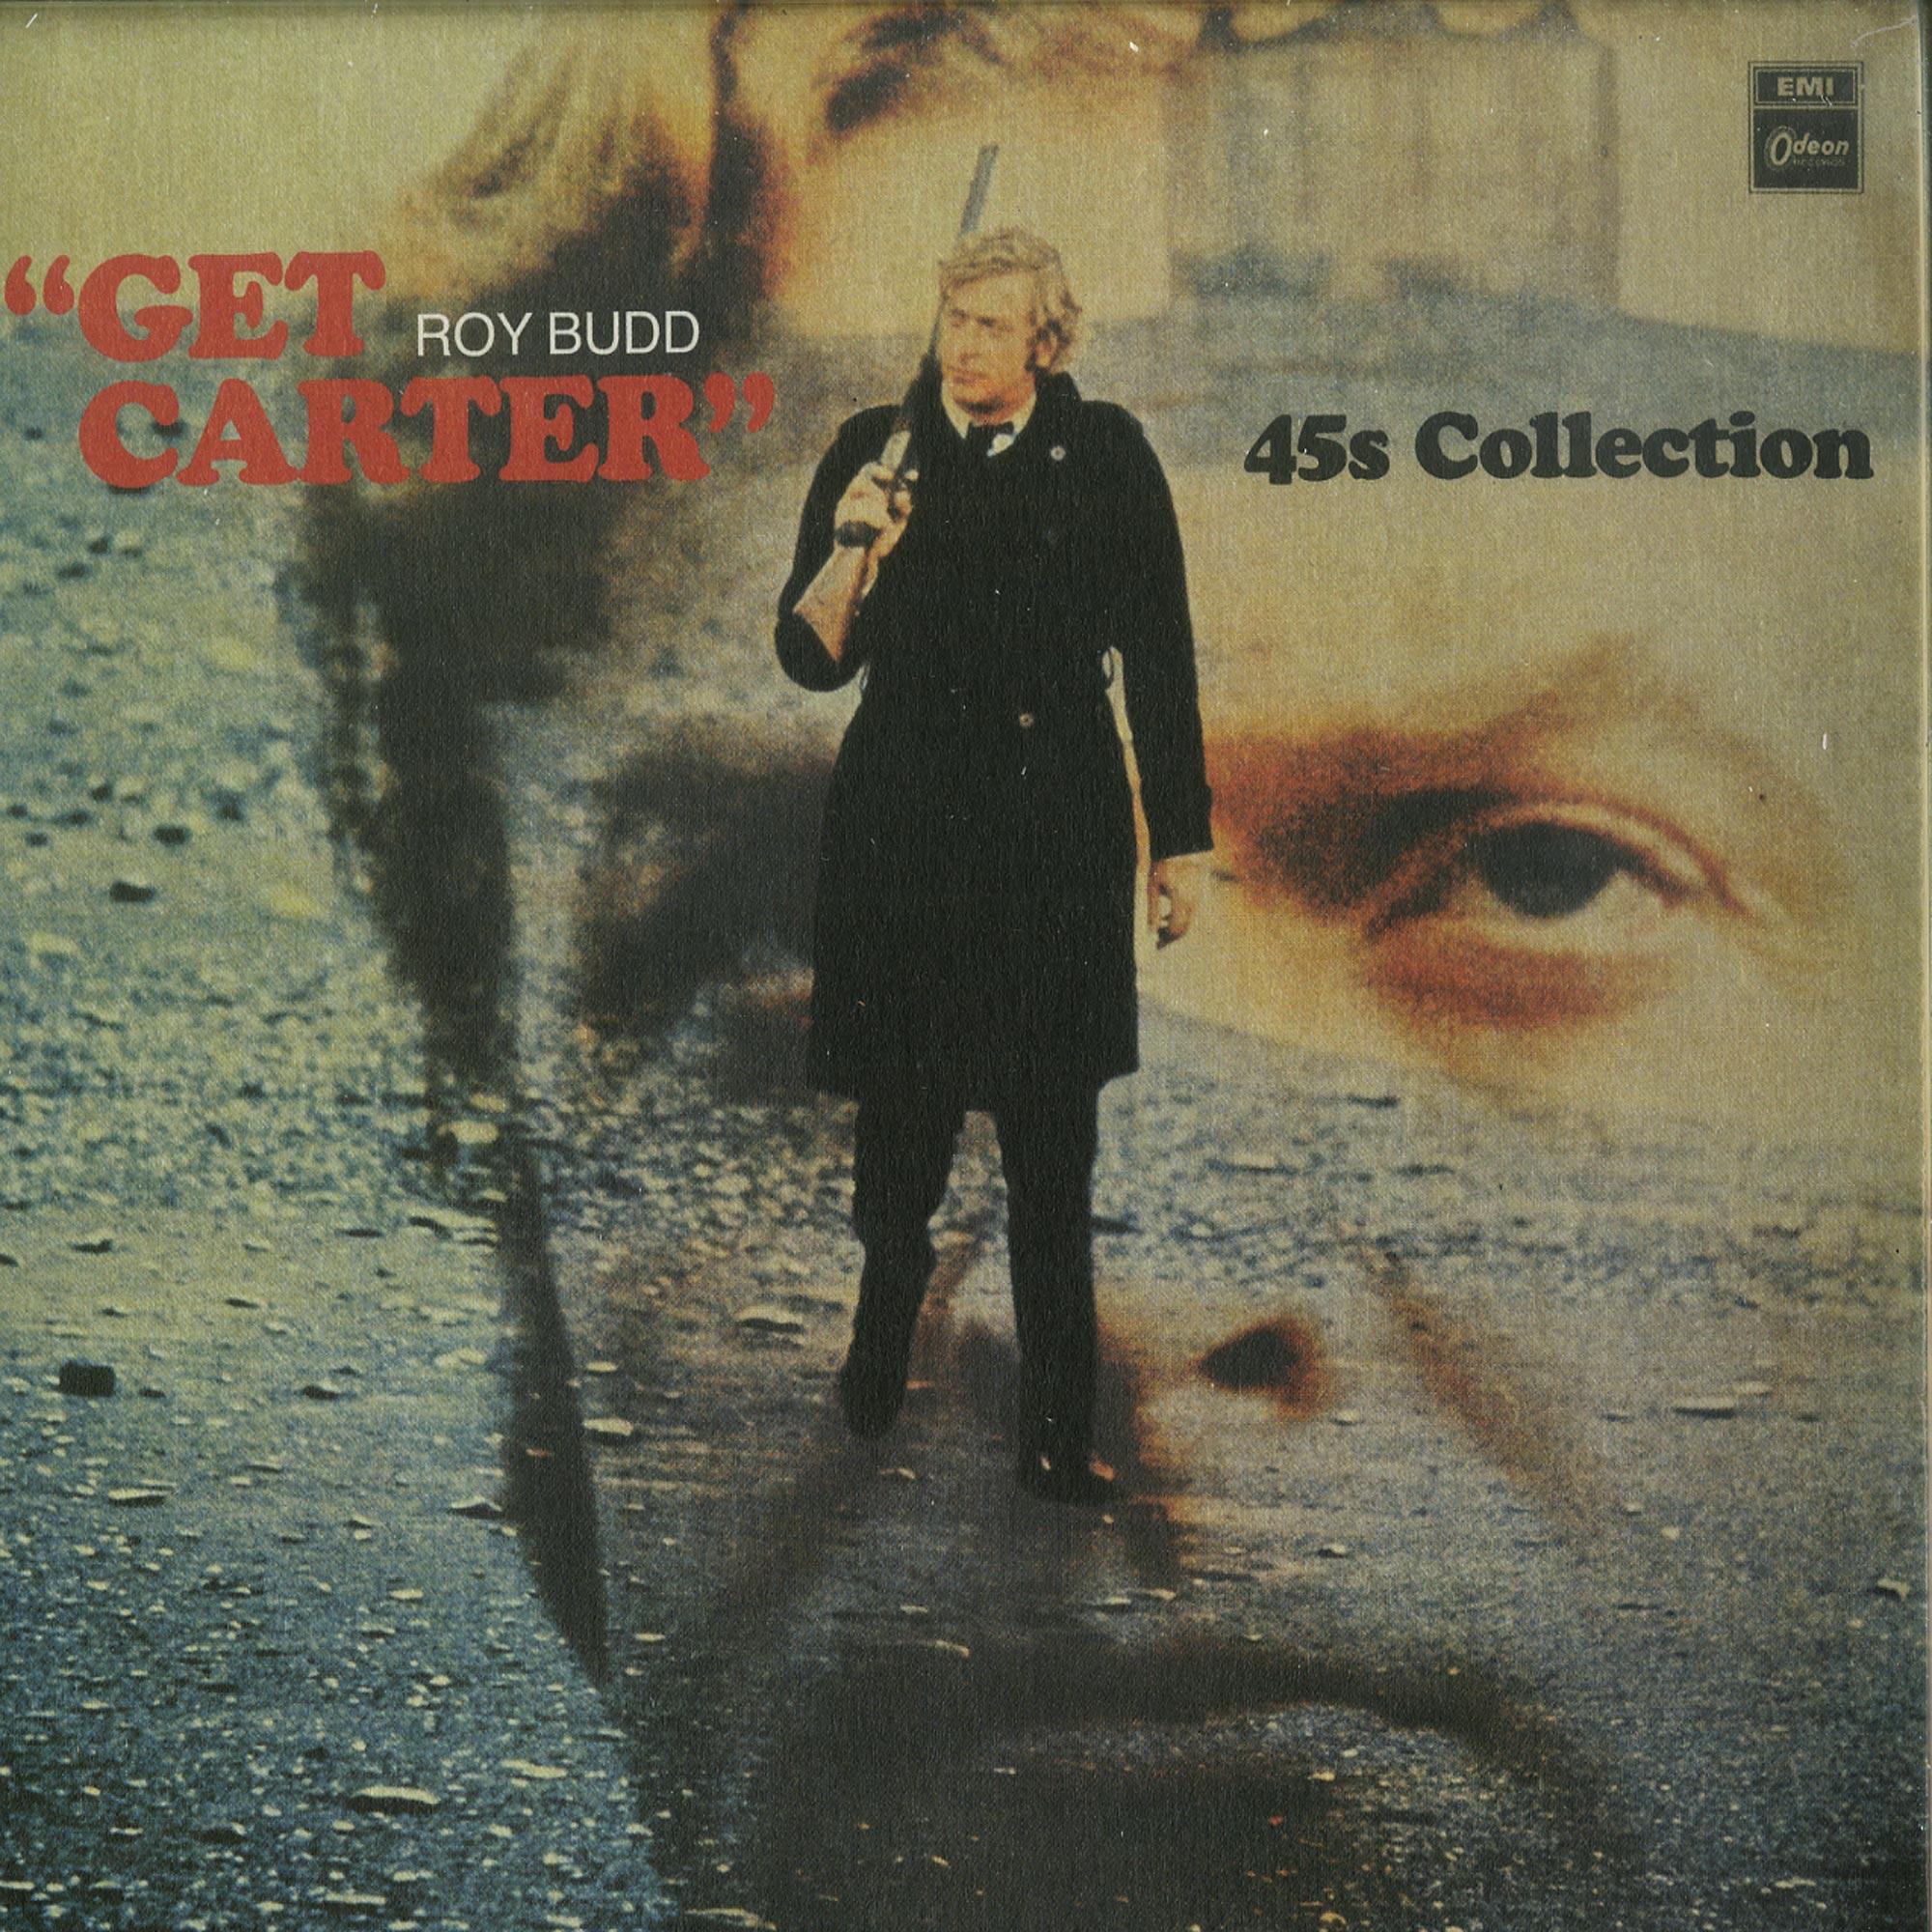 Roy Budd - GET CARTER O.S.T.